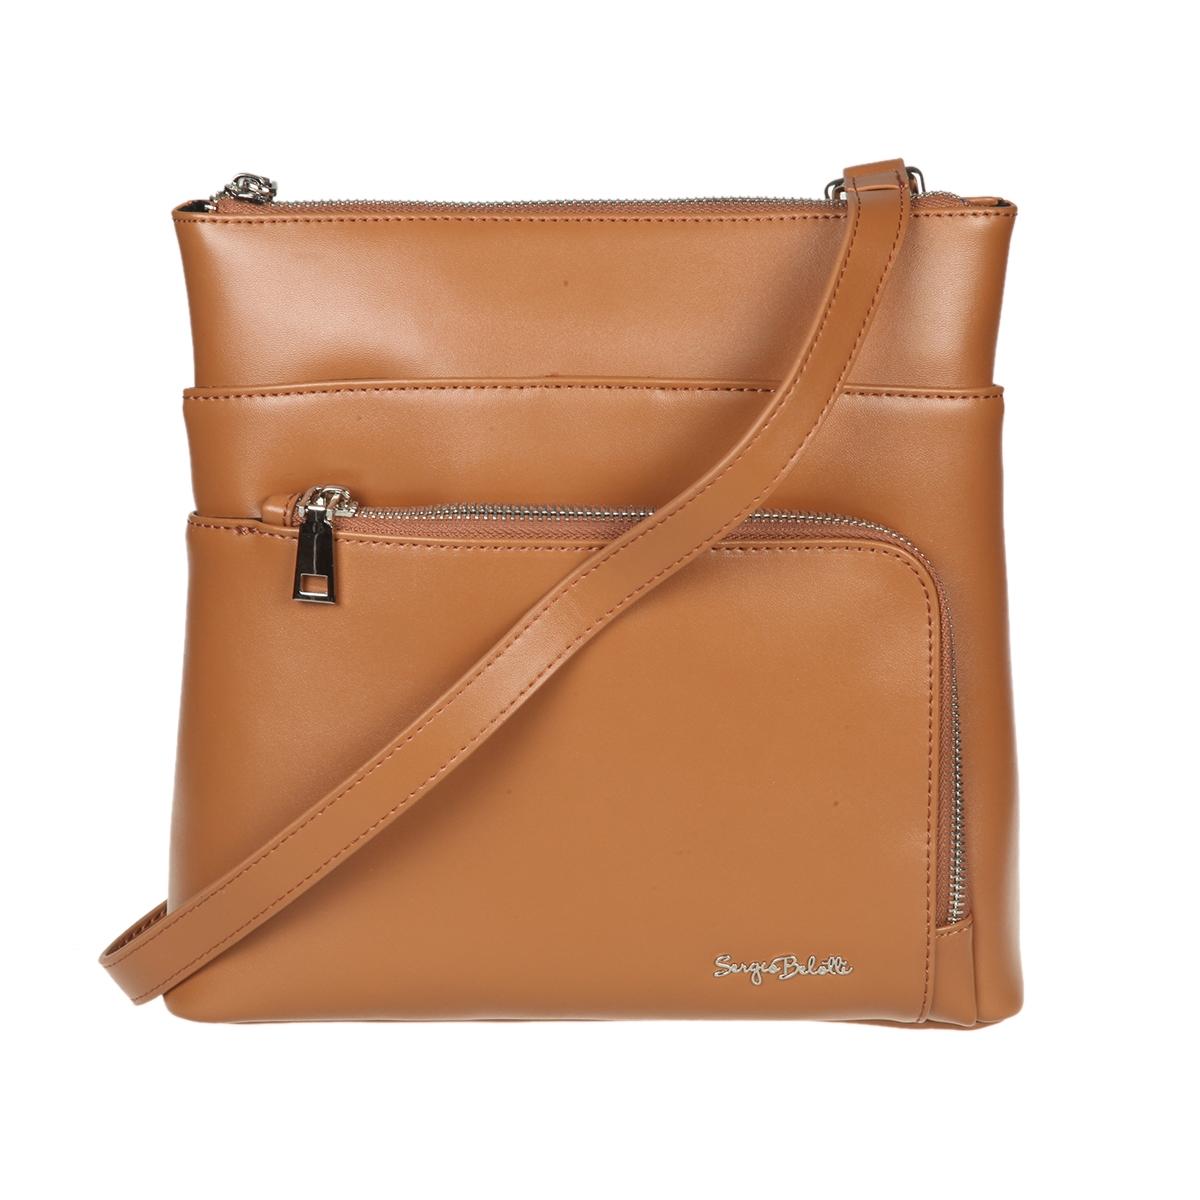 9b4705c27c7d Сумка Sergio Belotti 648 brown, 25.5x25 см, натуральная кожа, цвет ...